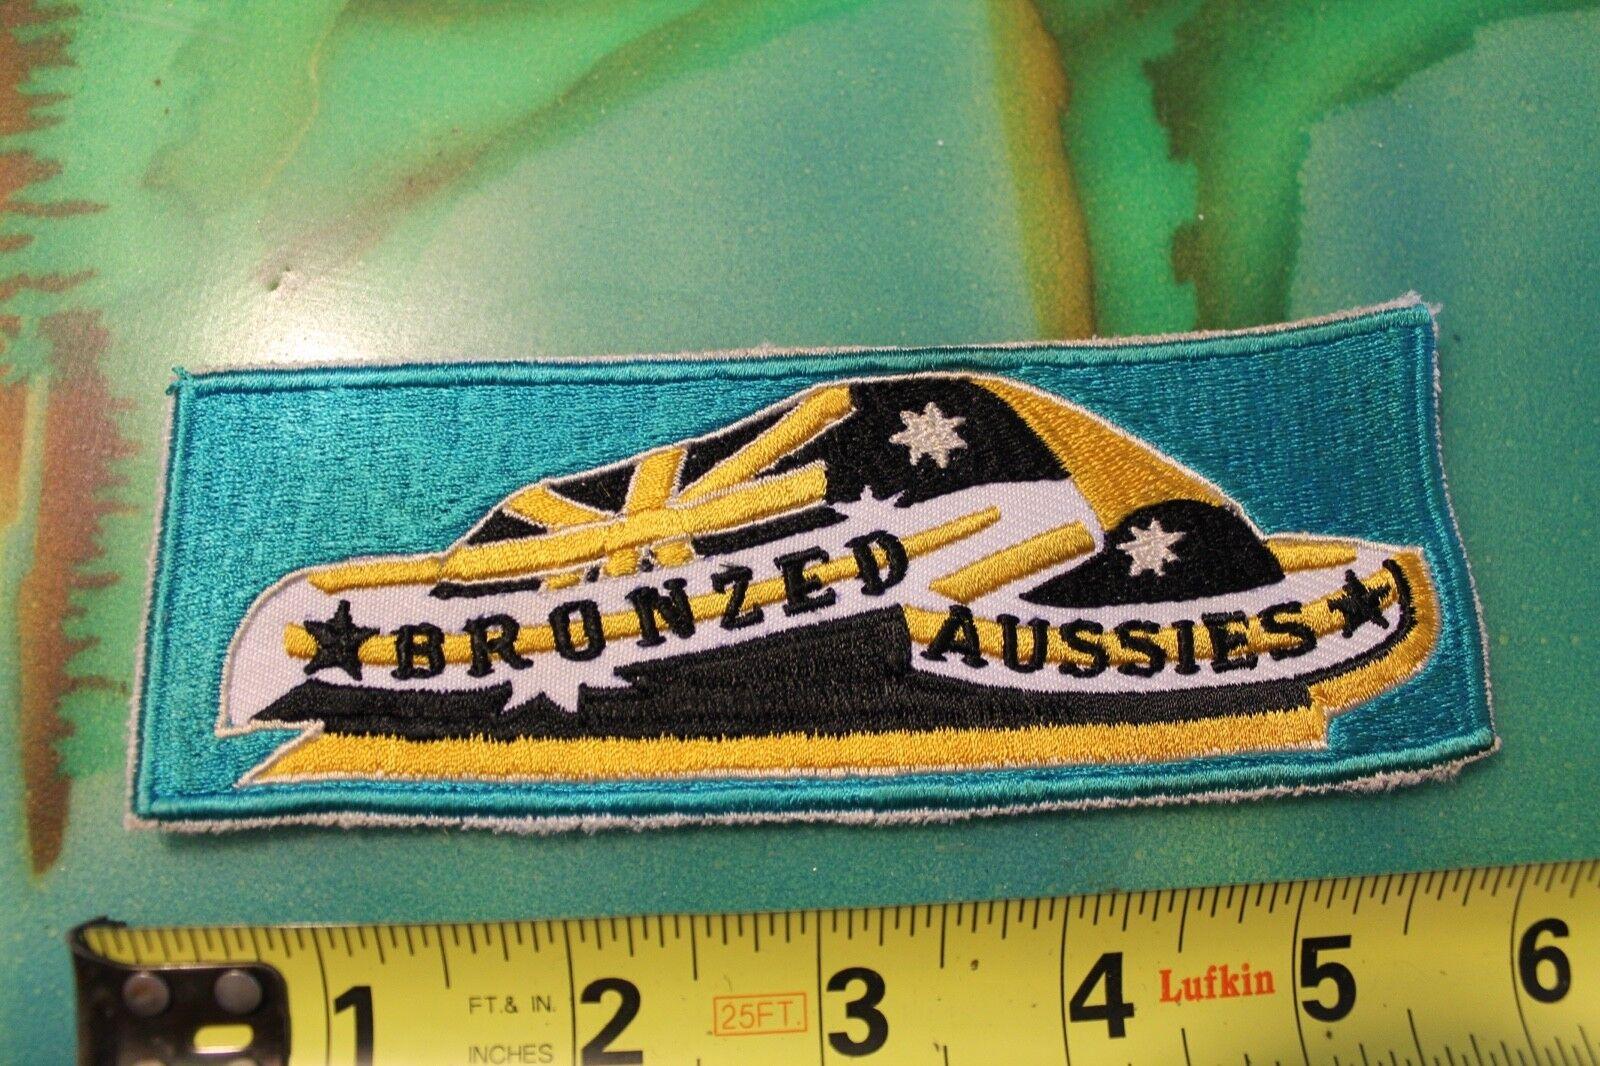 Bronceado australianos Tablas De Surf Australia AUS Original Vintage Década de 1970 Surf Parche